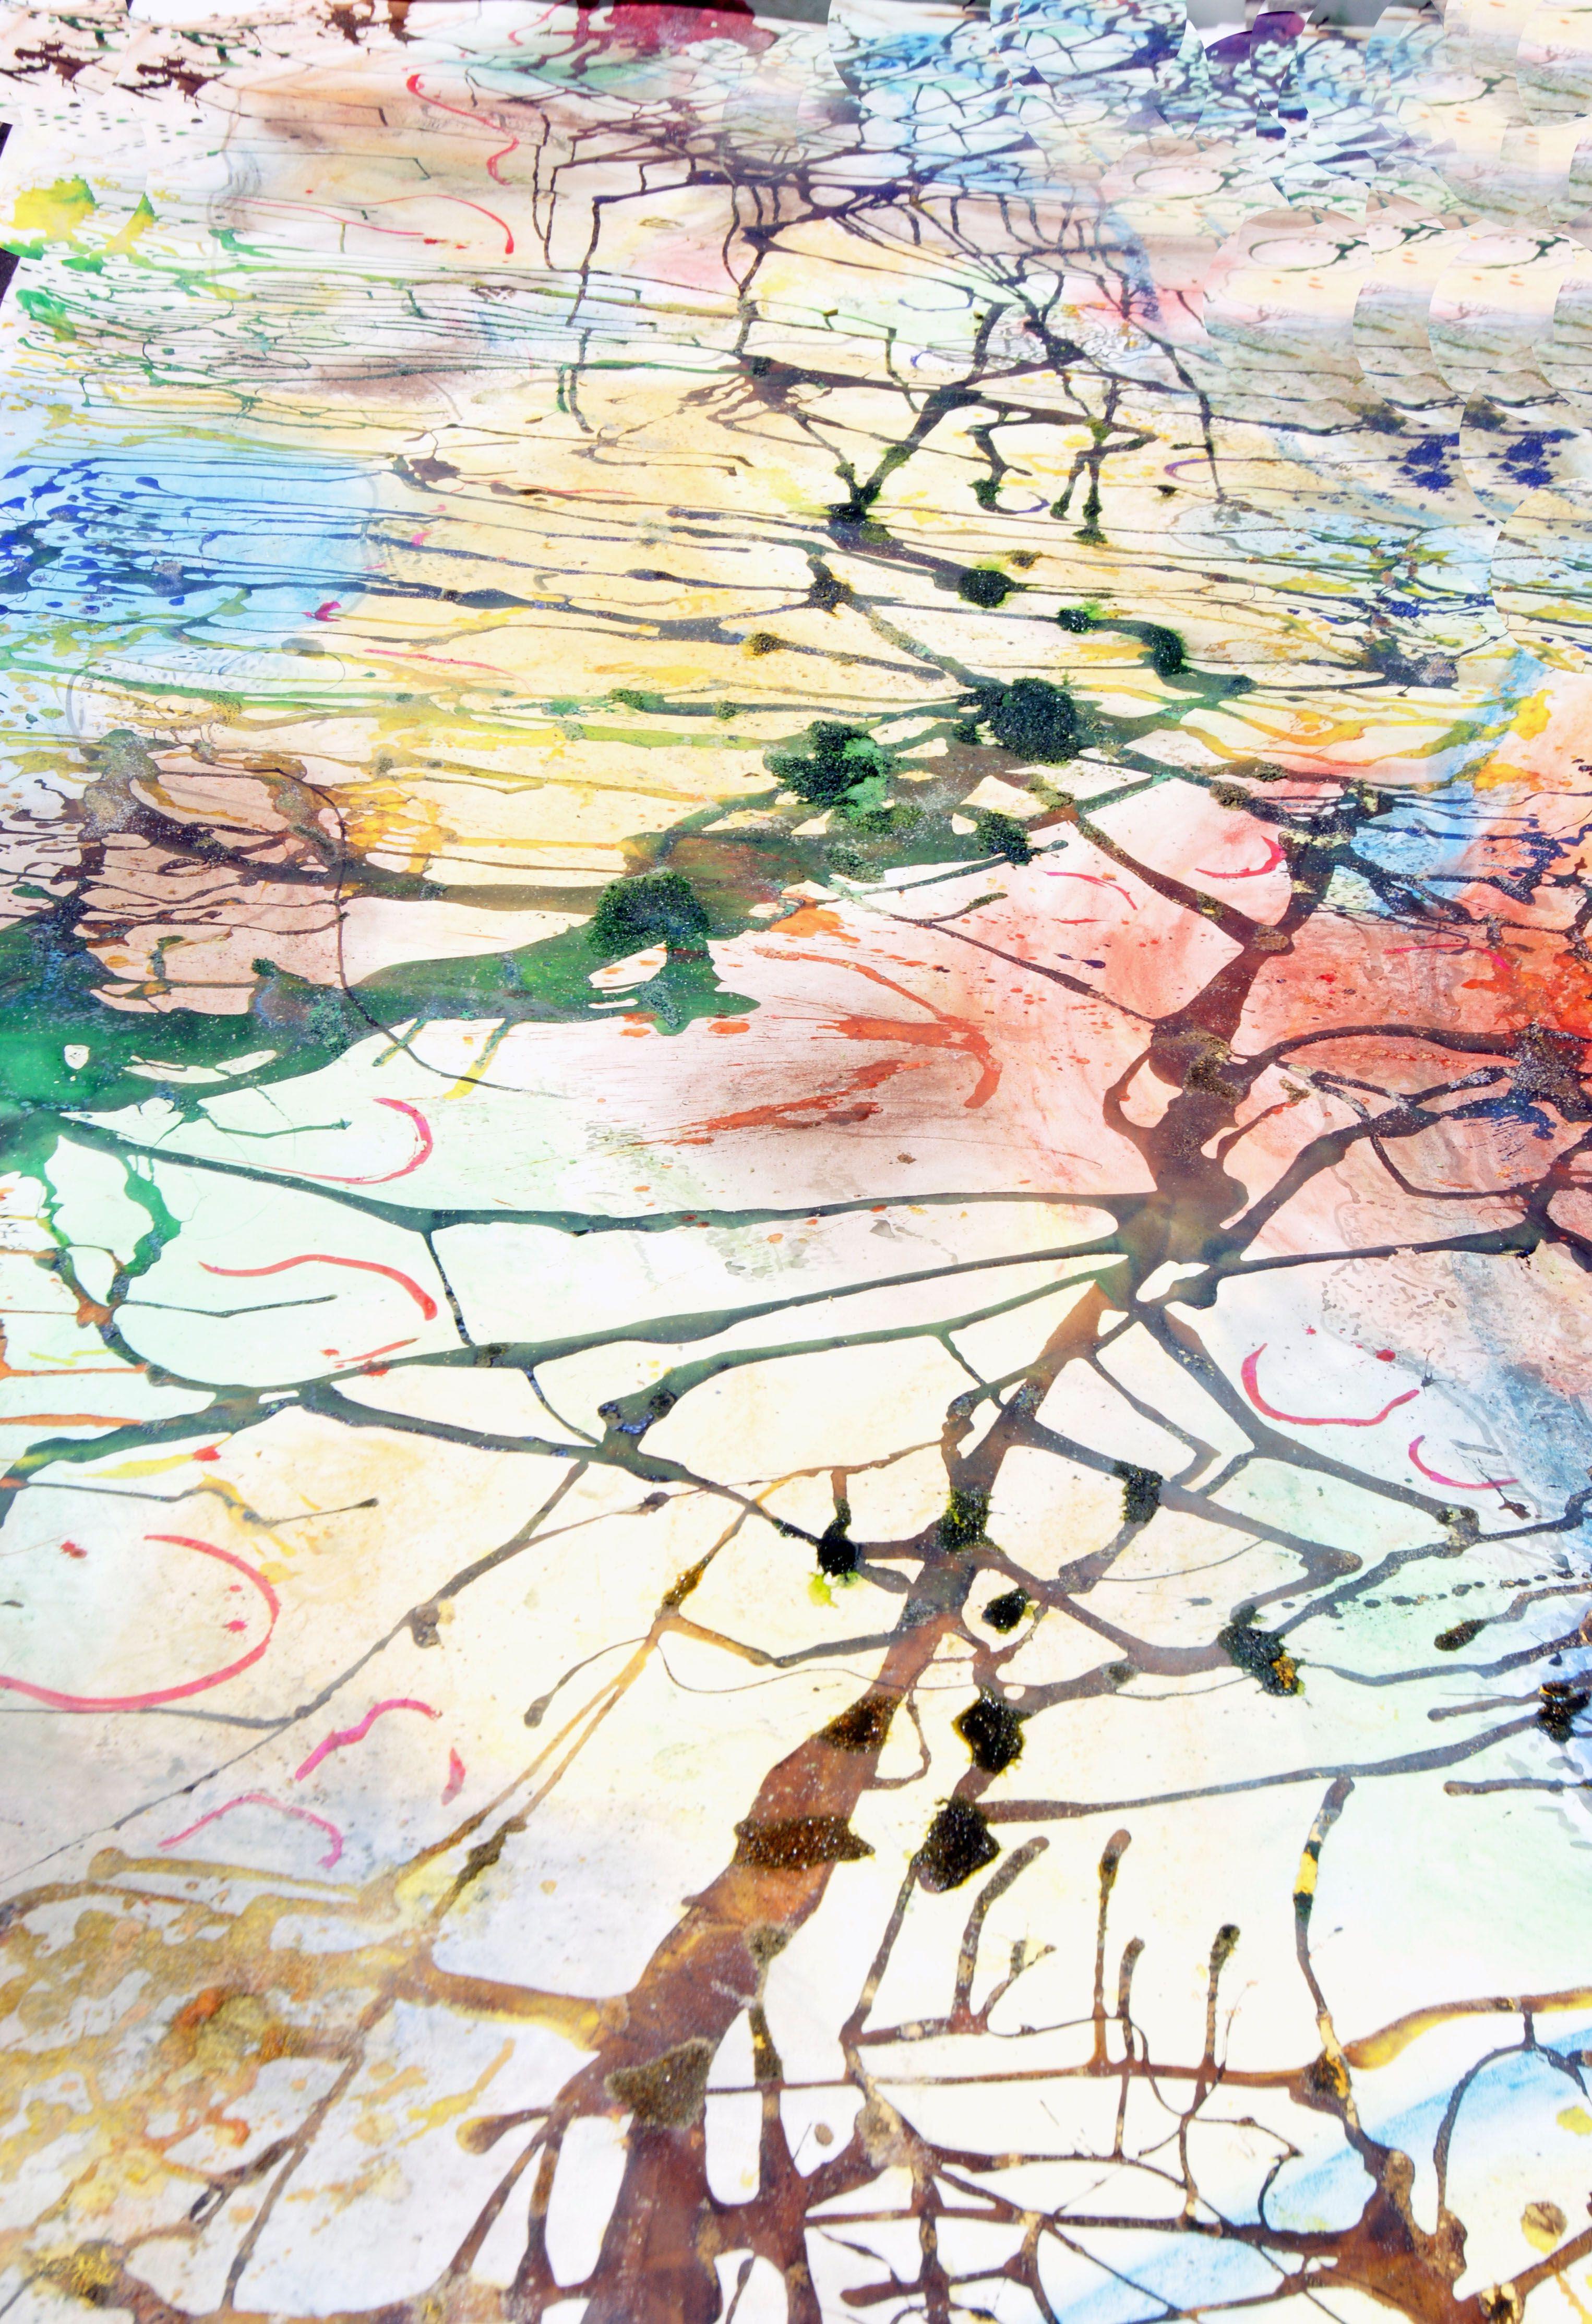 Pre-Kindergarten  4.5 meter mixed media work  inspired by John Olsen artworks. Pastel and ink. PYP Art Trinity Grammar School Sydney.